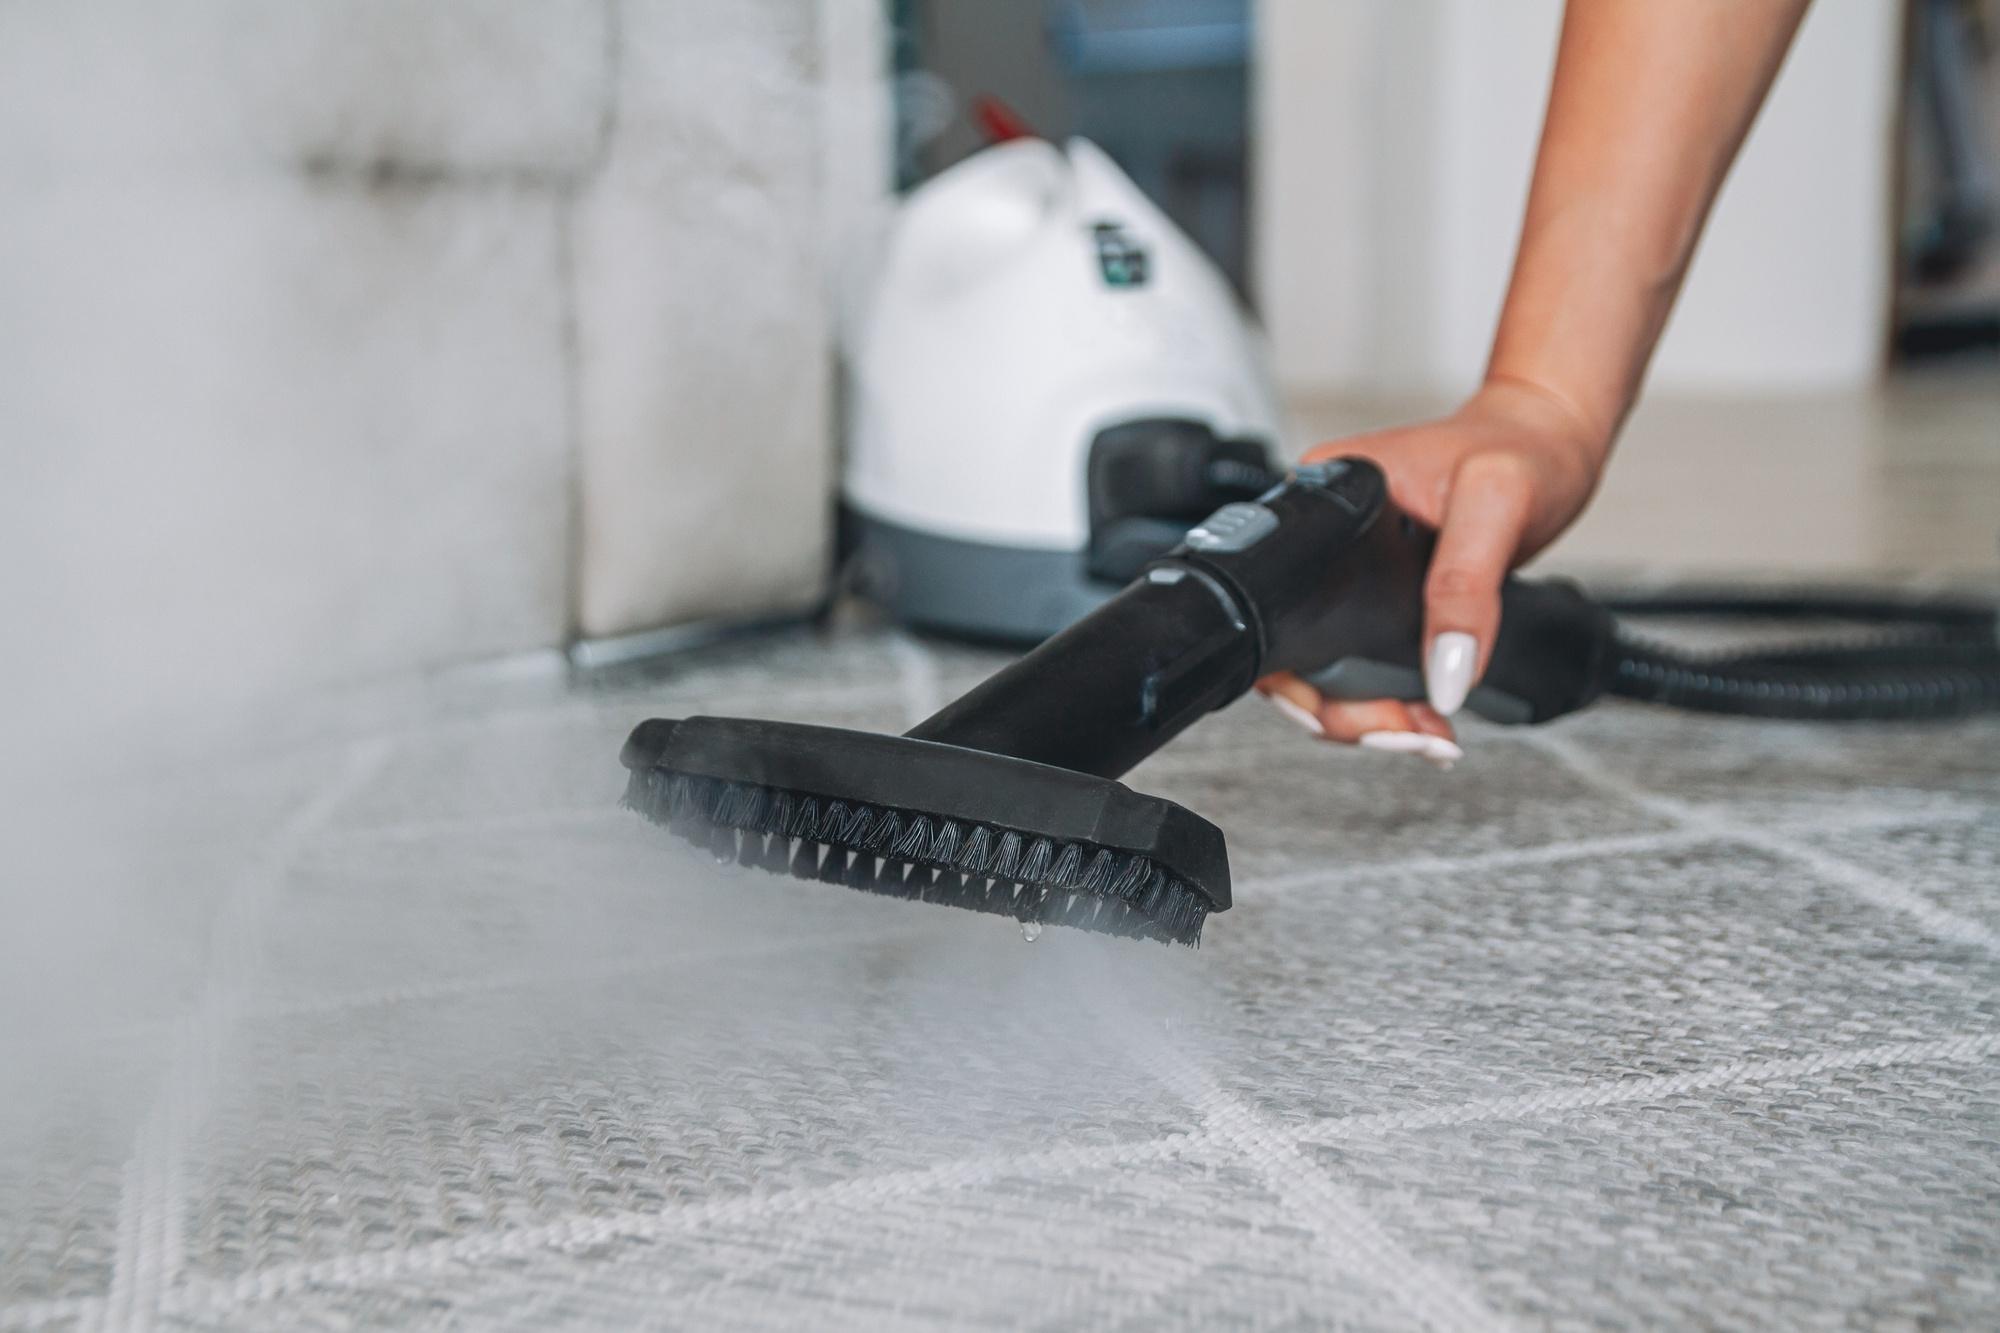 Steam cleaner on rug